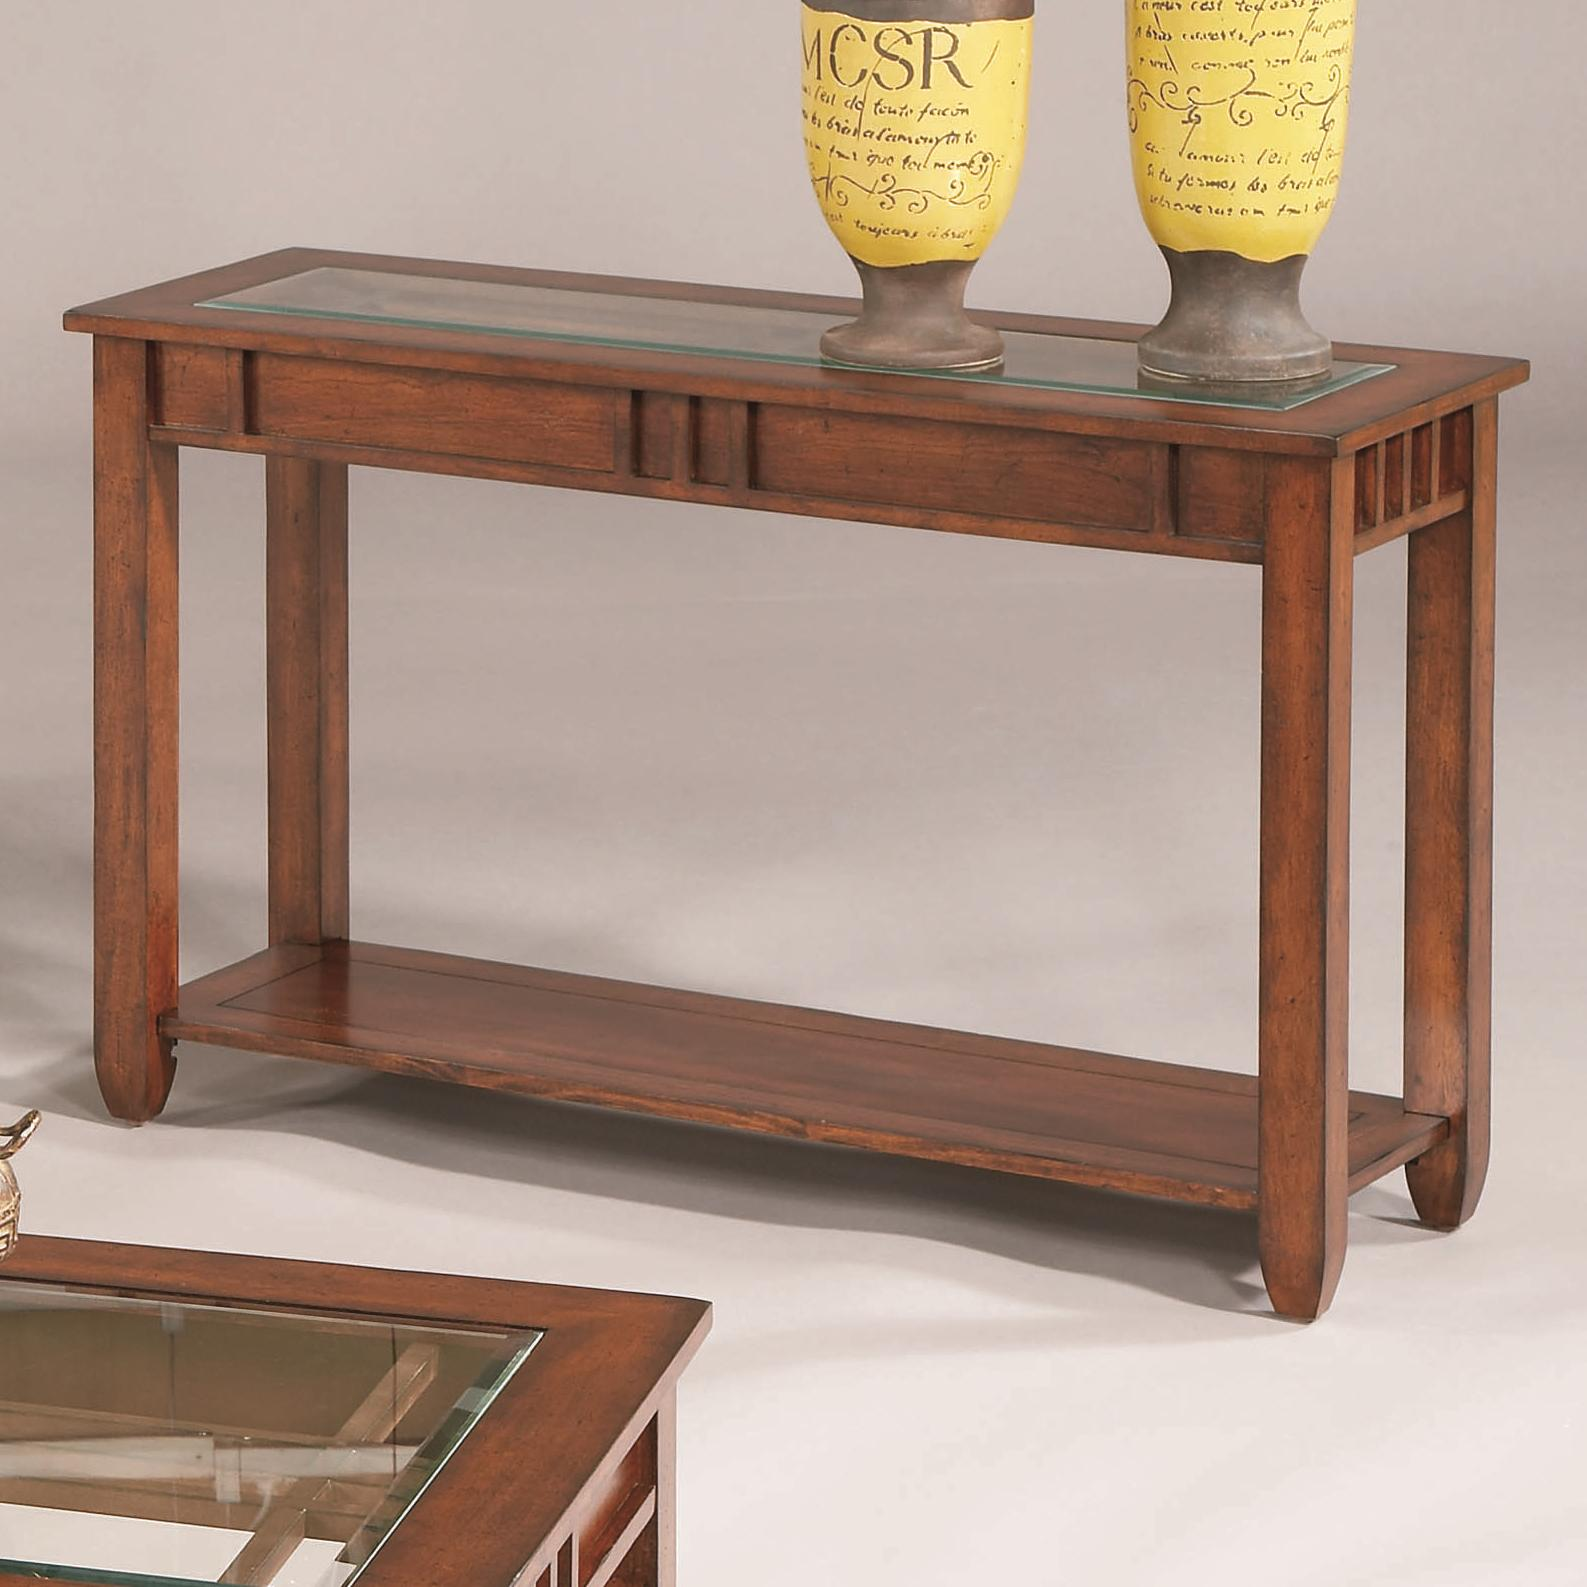 Progressive Furniture Mission Hills Sofa Table - Item Number: 44052-05